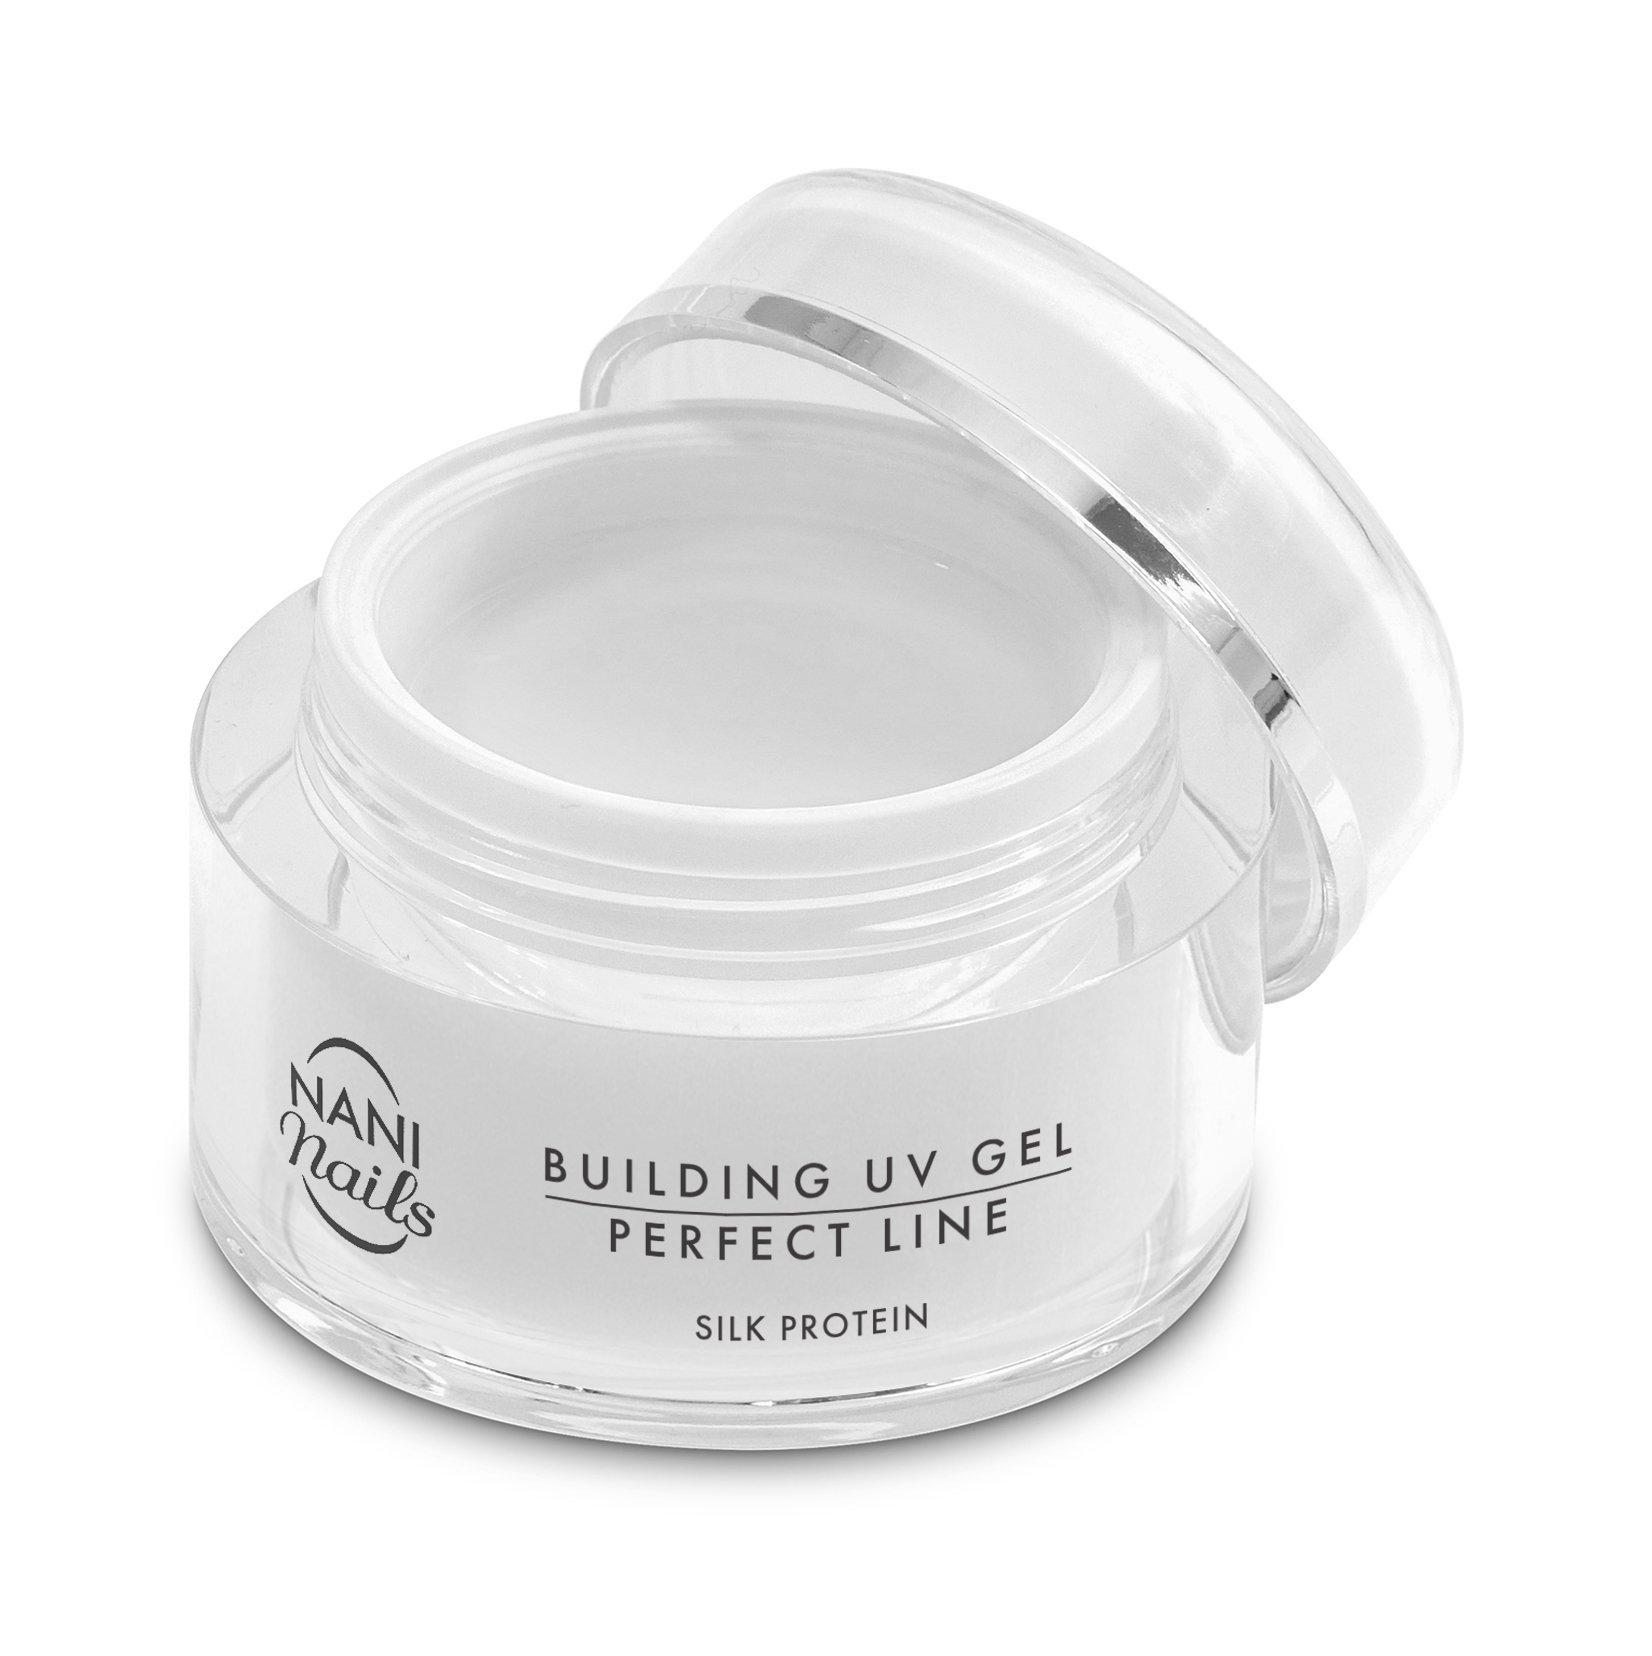 NANI UV gél Perfect Line 15 ml - Silk Protein